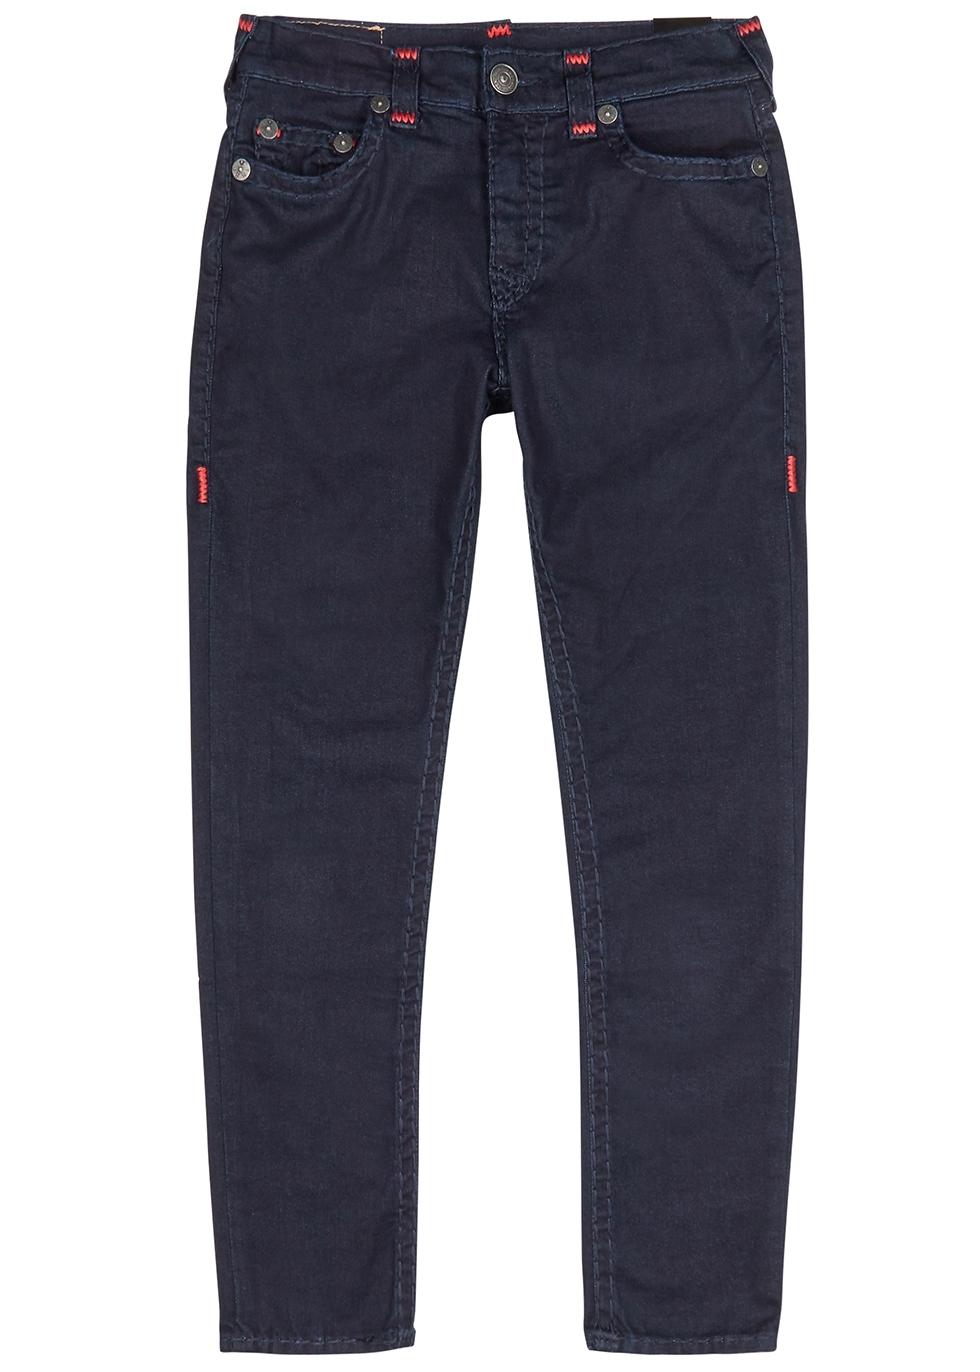 Jack indigo skinny jeans - True Religion